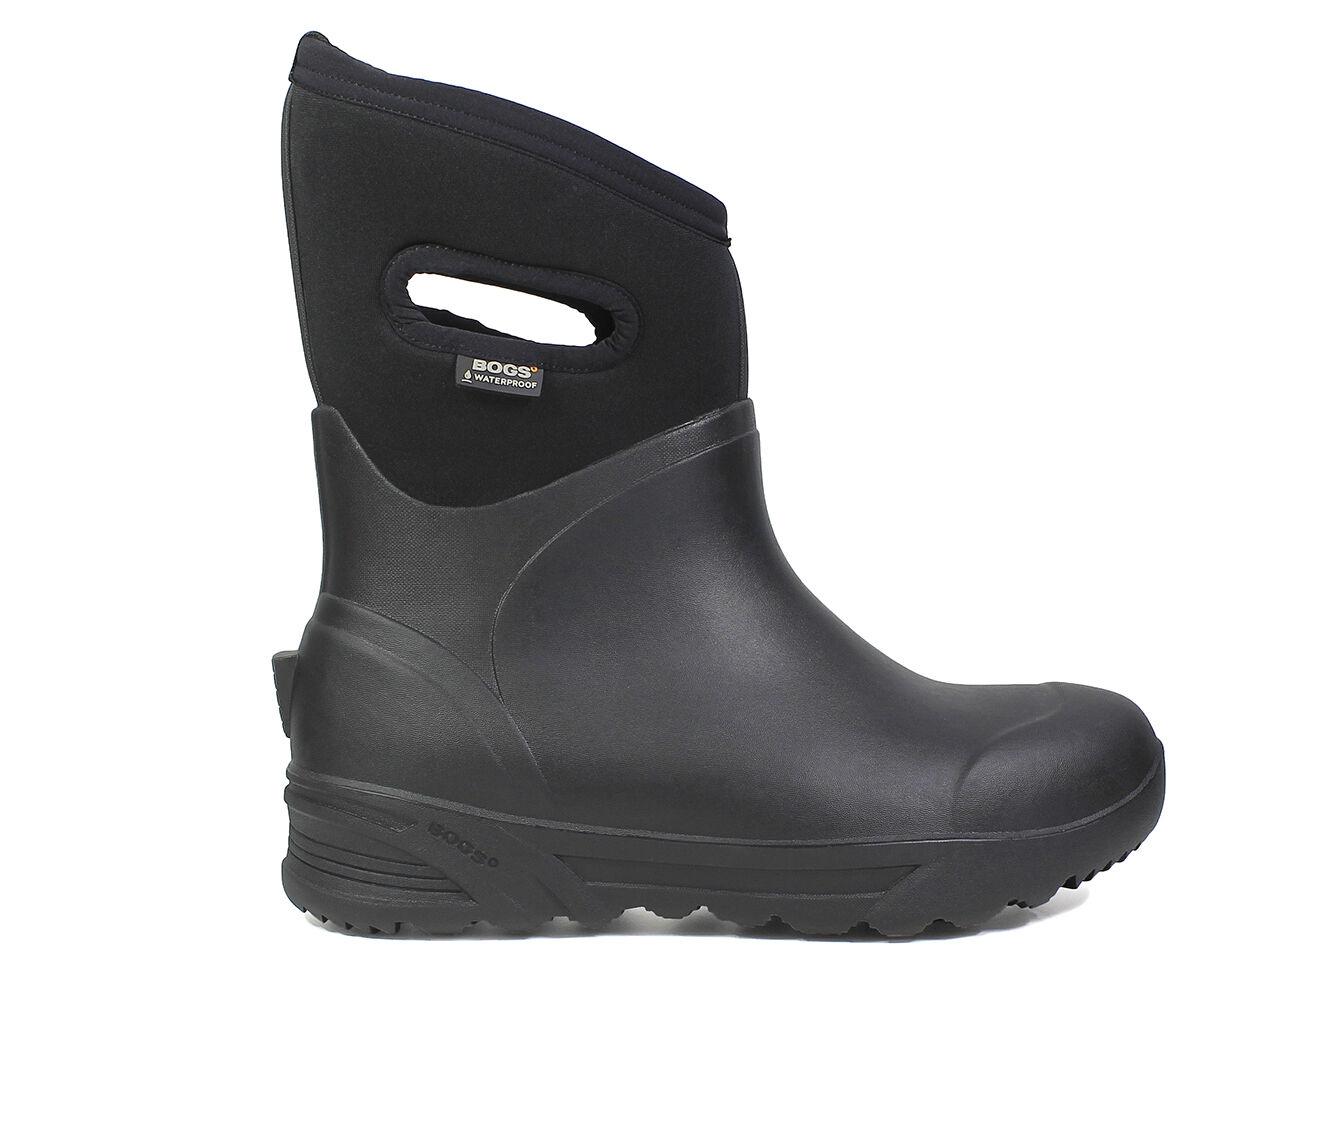 Men's Bogs Footwear Bozeman Mid Insulated Waterproof Boot Insulated Boots BLACK